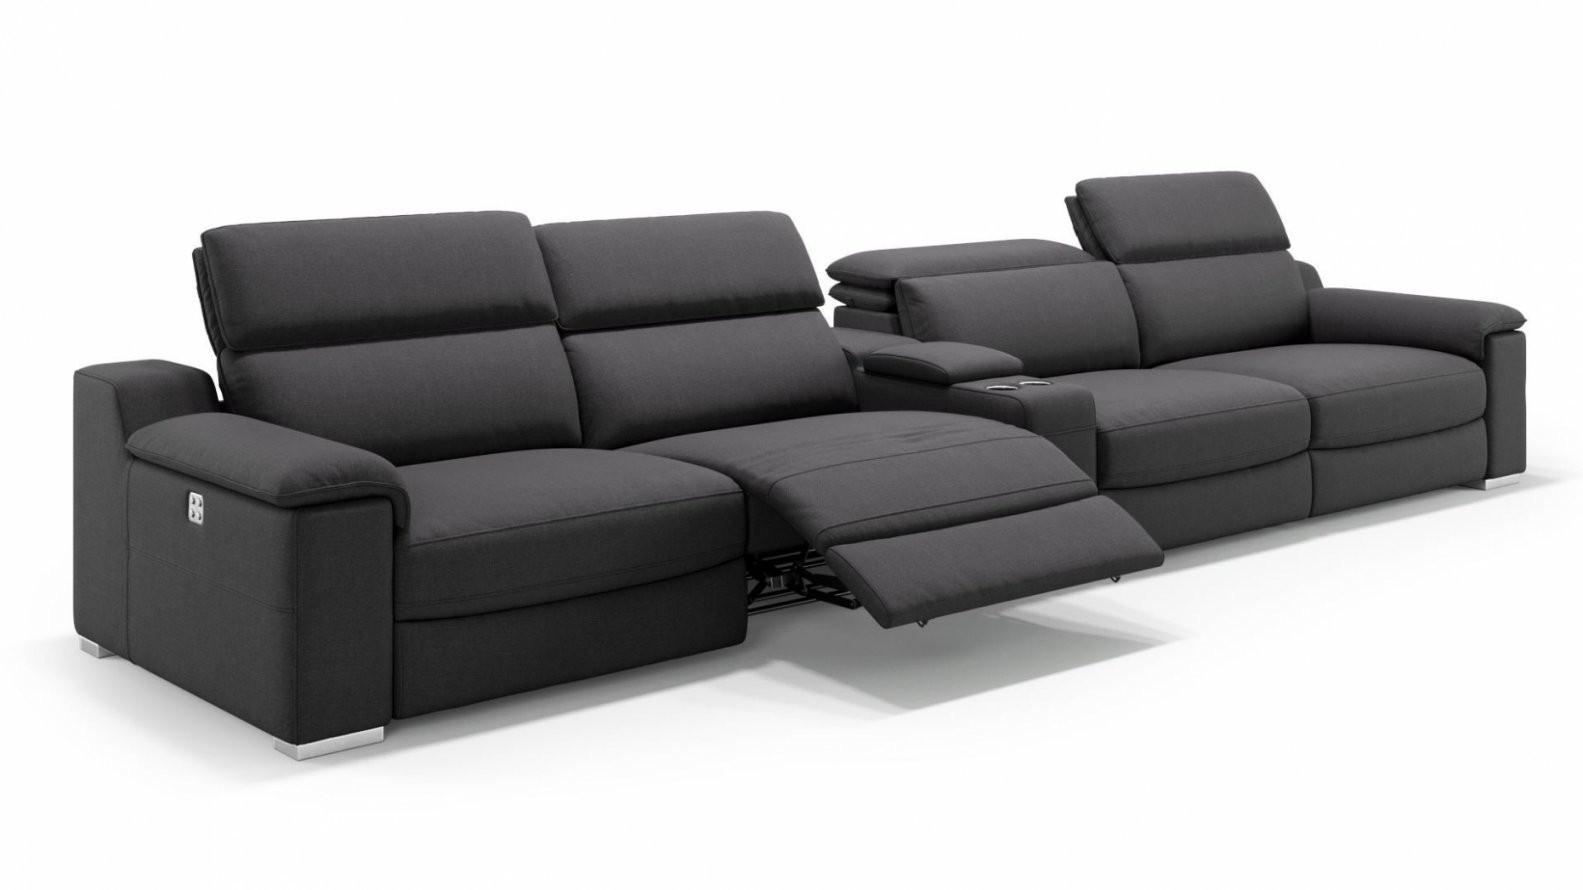 Sofa 4 Sitzer — Yct Projekte von Sofa 4 Sitzer Leder Photo